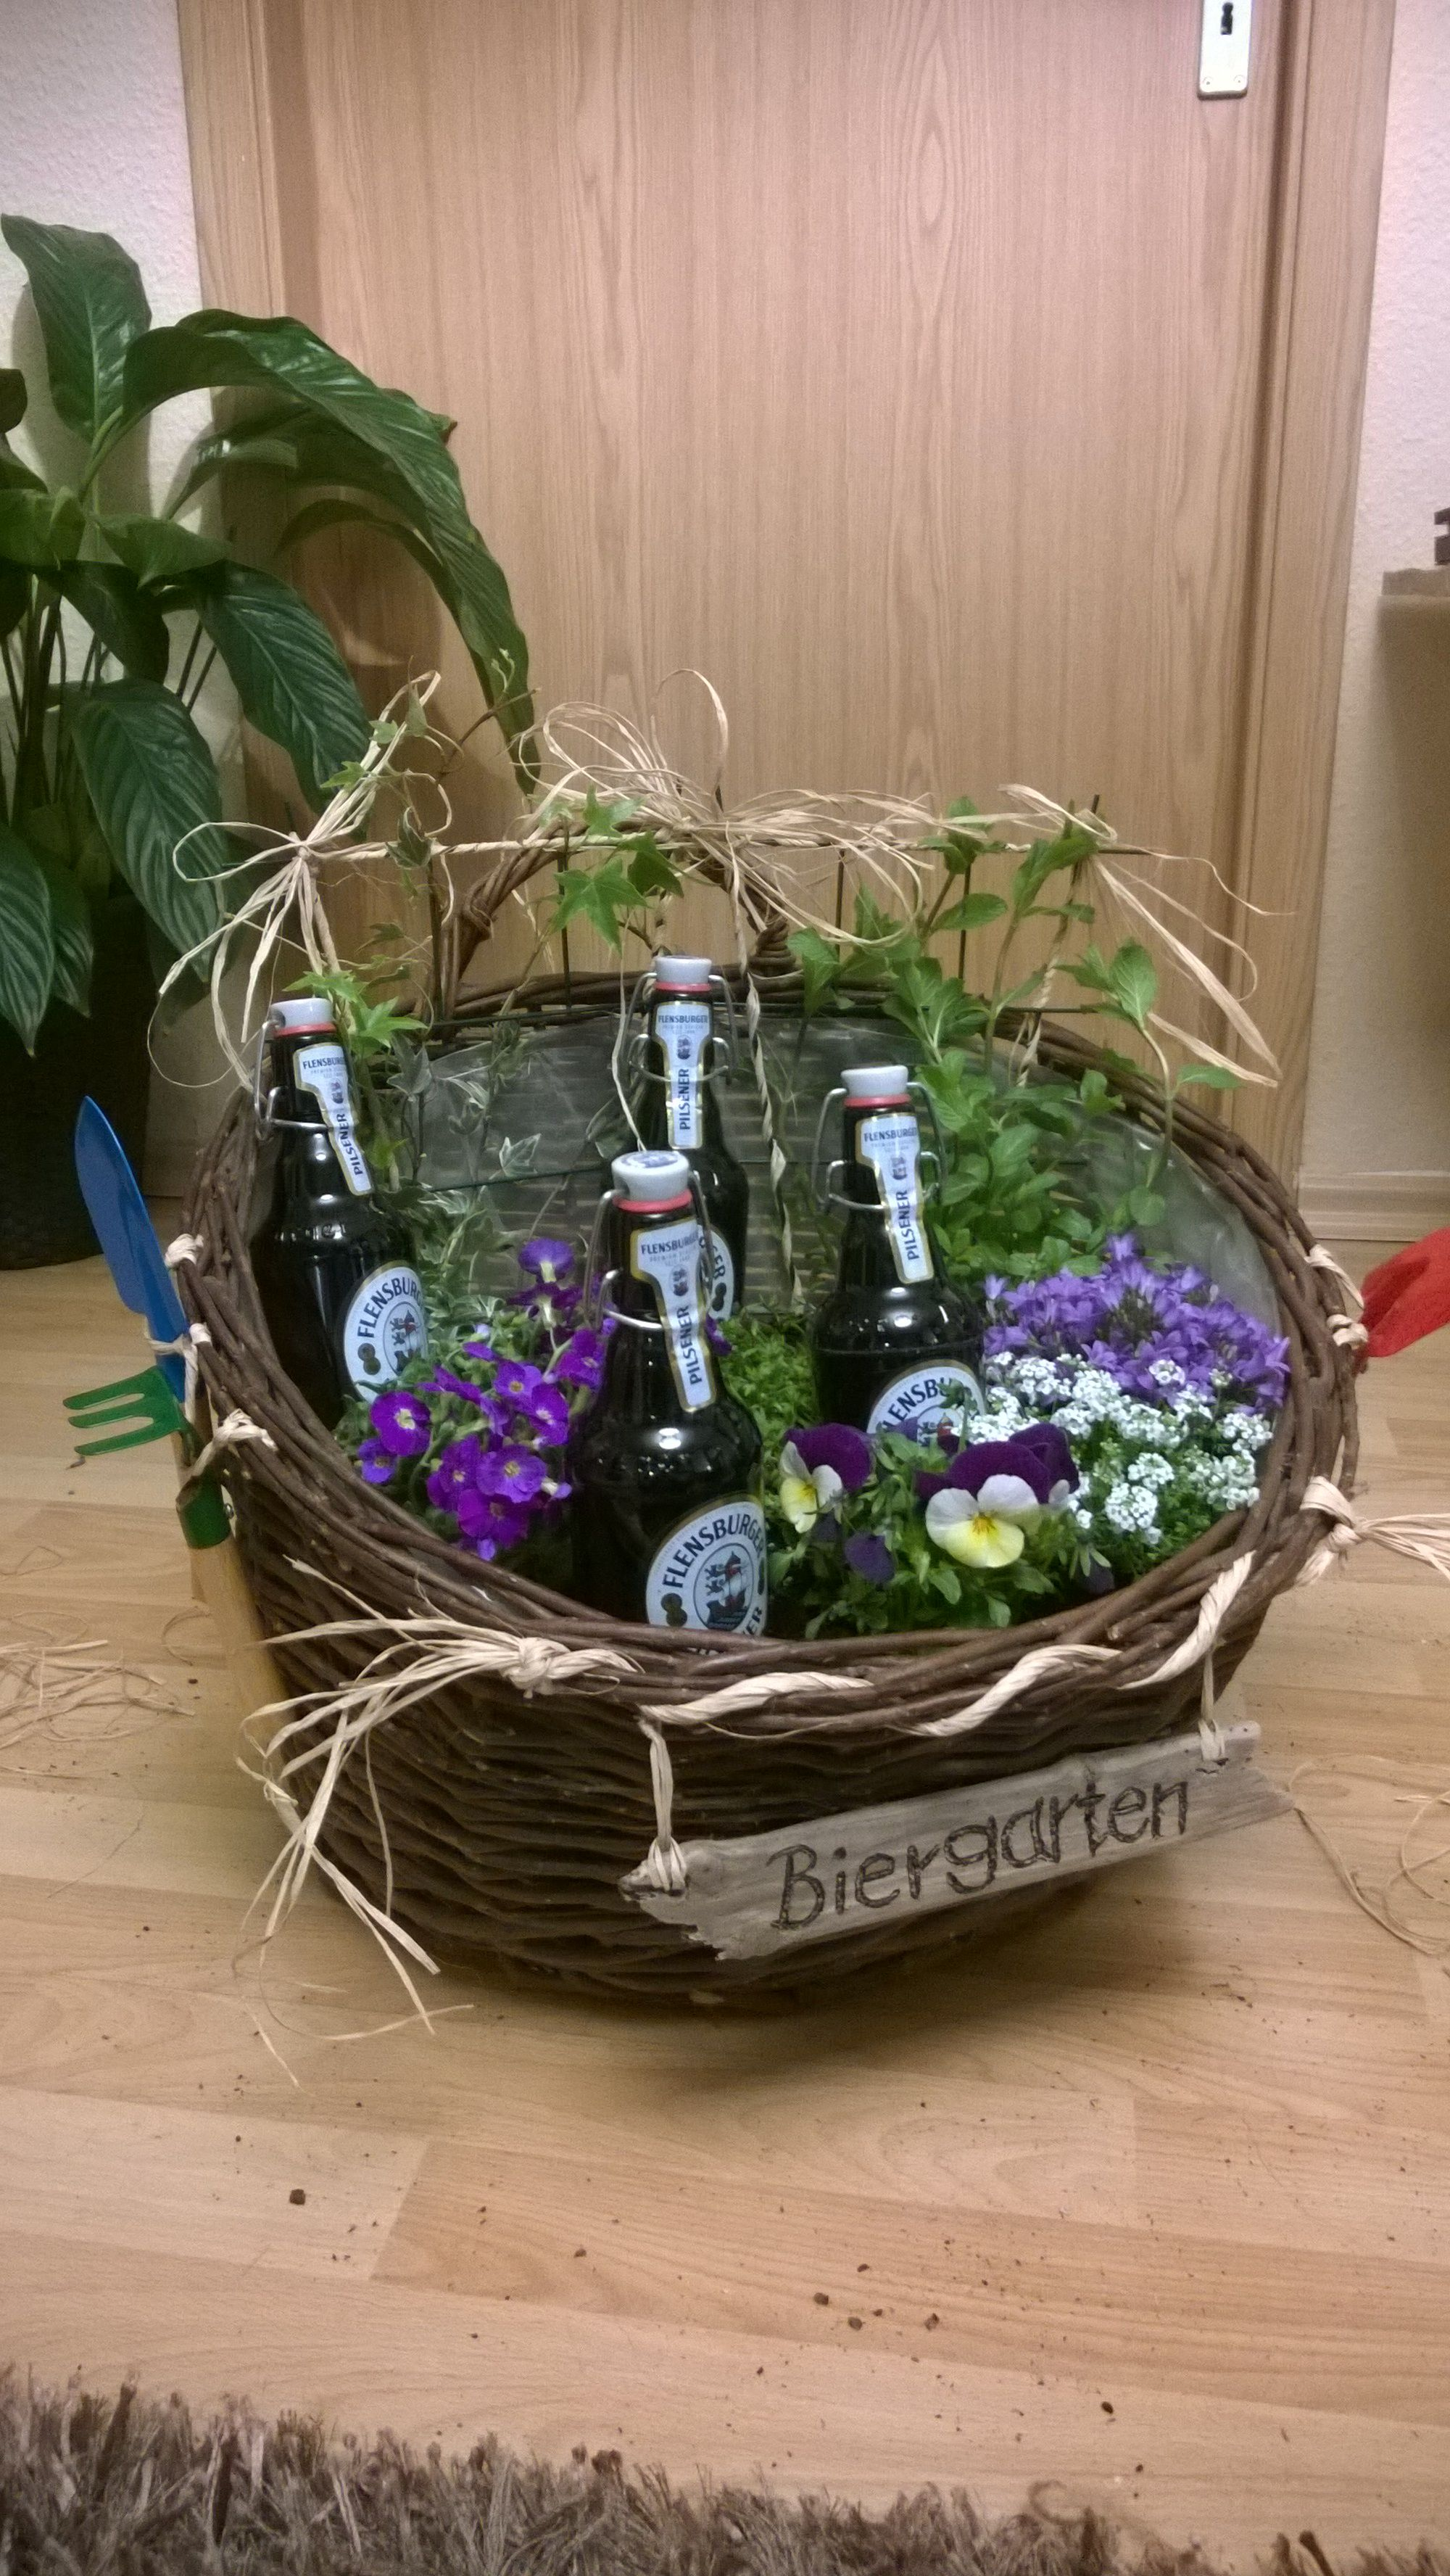 Garten Geschenke Fur Manner Biergarten Blumen Geschenk Blumenkorb